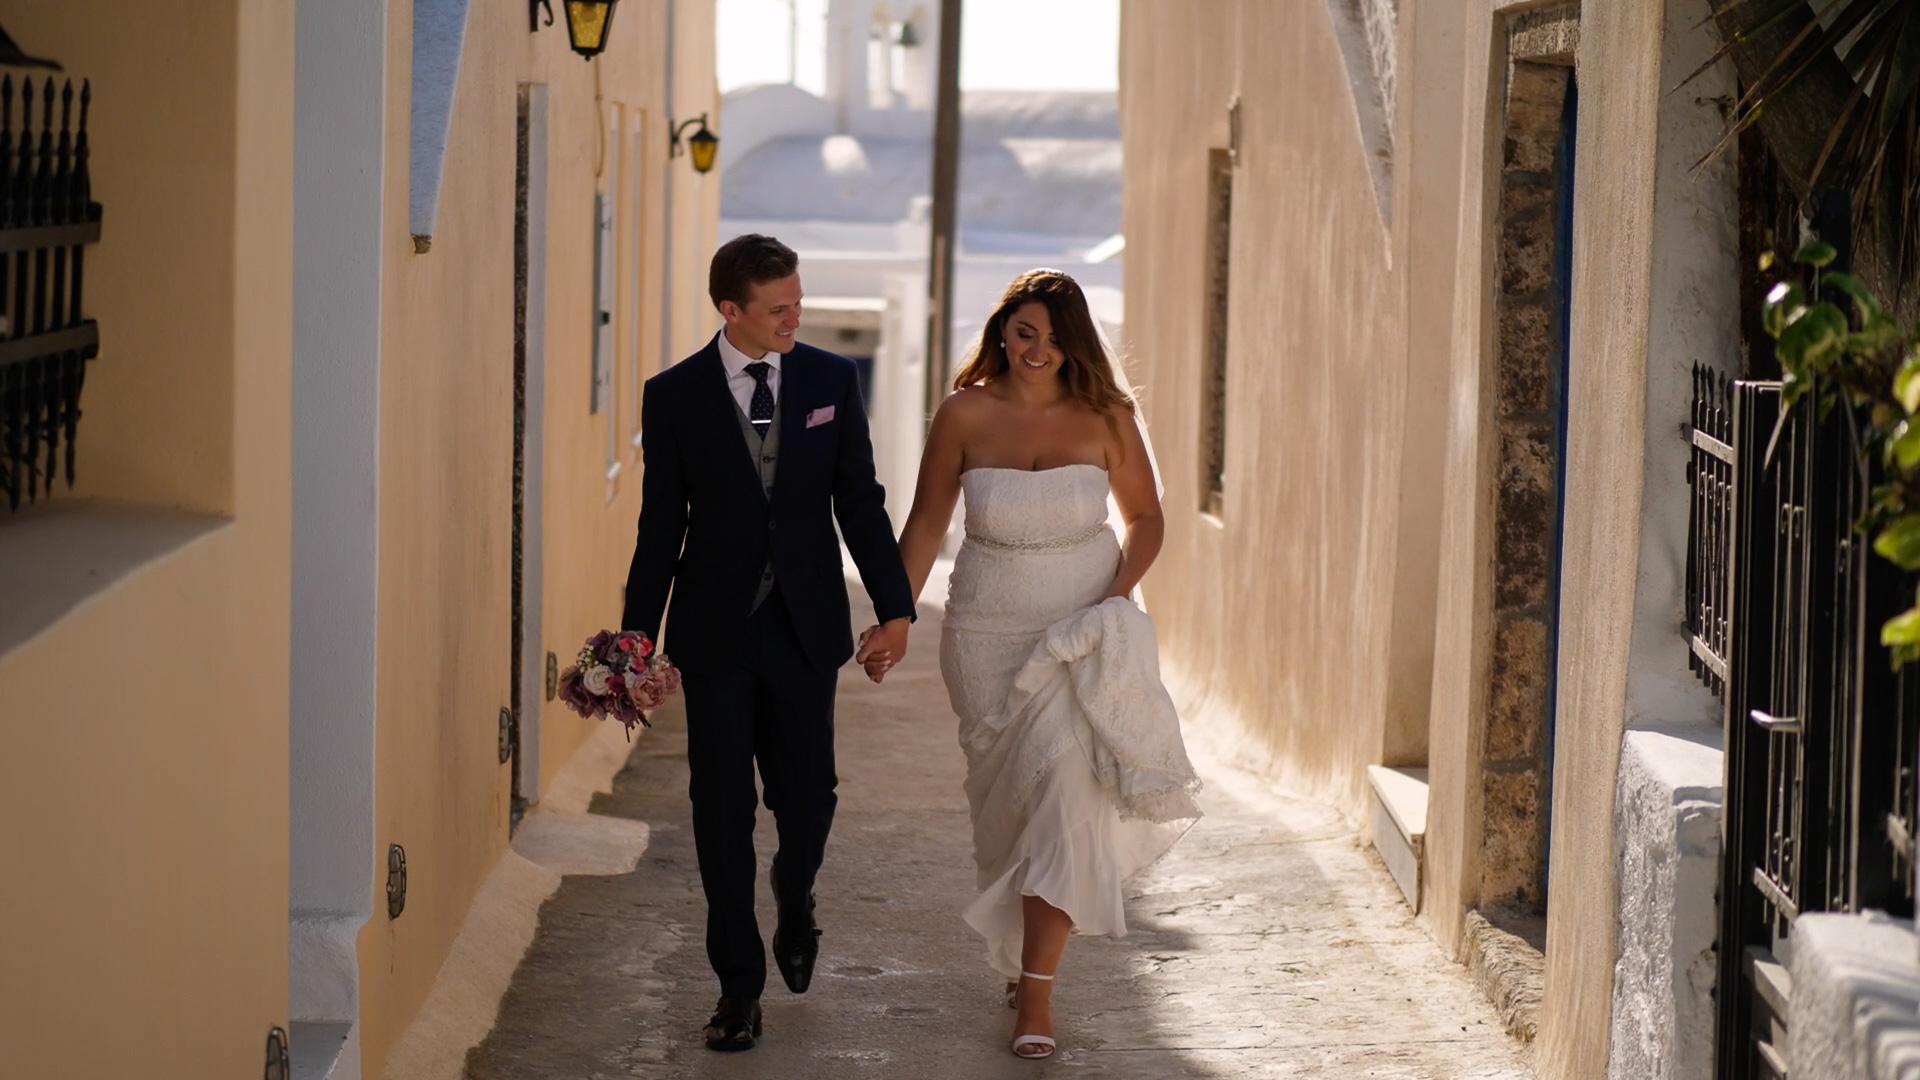 Santorini Wedding Videographer captures Gareth and Sara walking through the beautiful, old streets of Pyrgos.